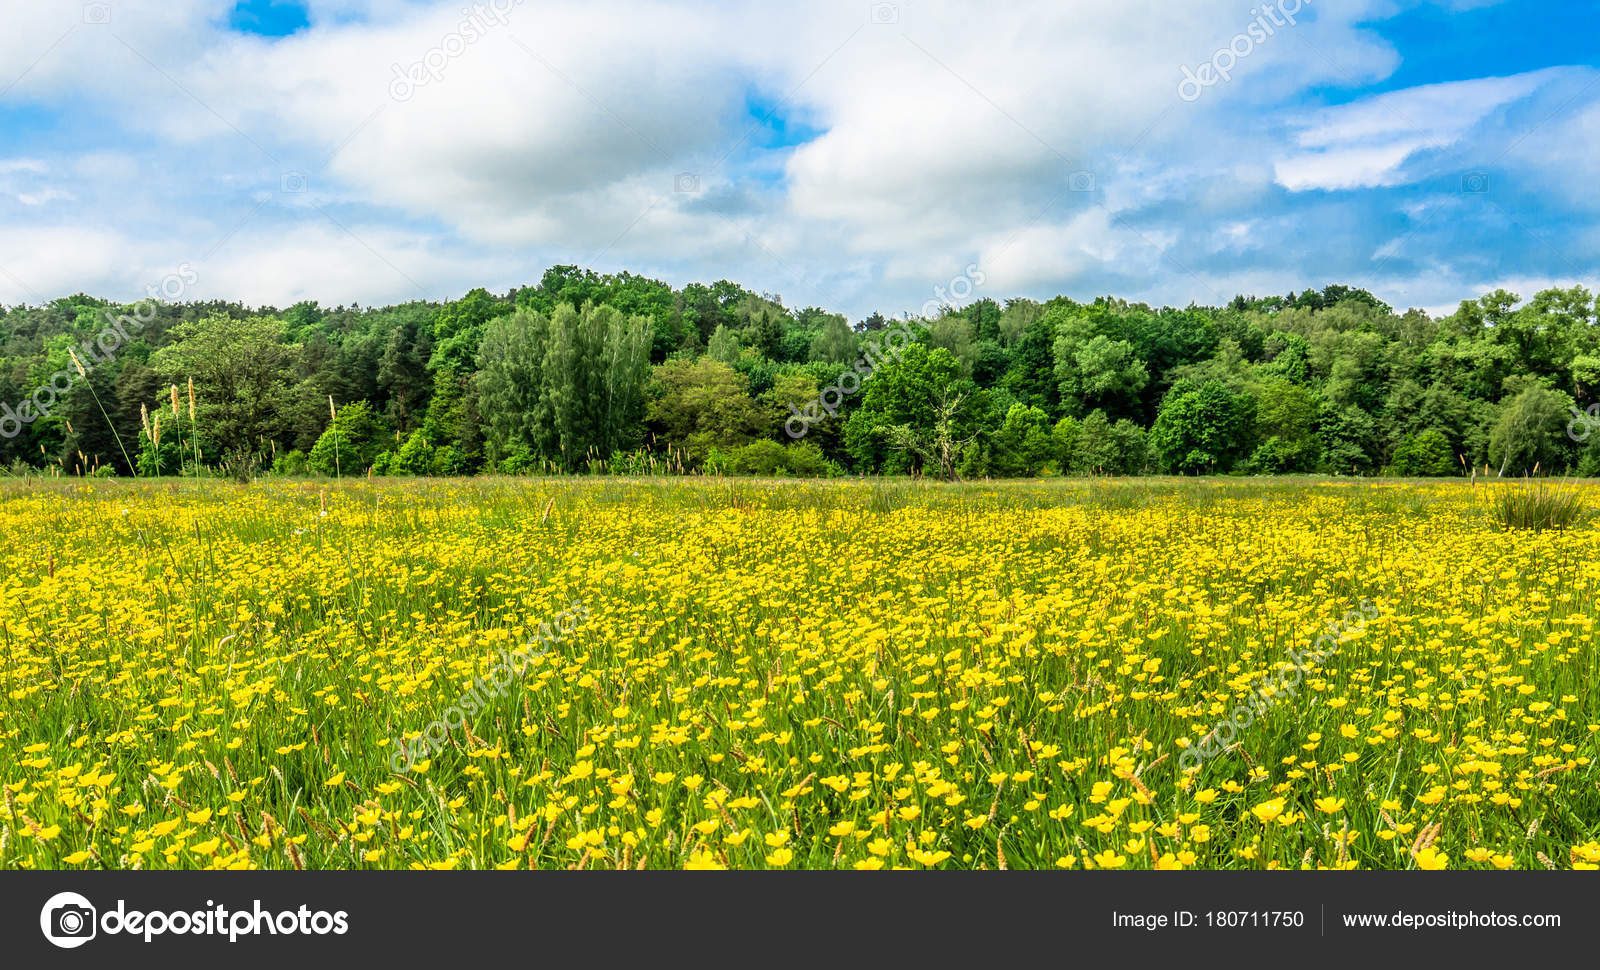 Yellow flowers field landscape background spring blooming meadow yellow flowers field landscape background spring blooming meadow buttercup flower stock photo mightylinksfo